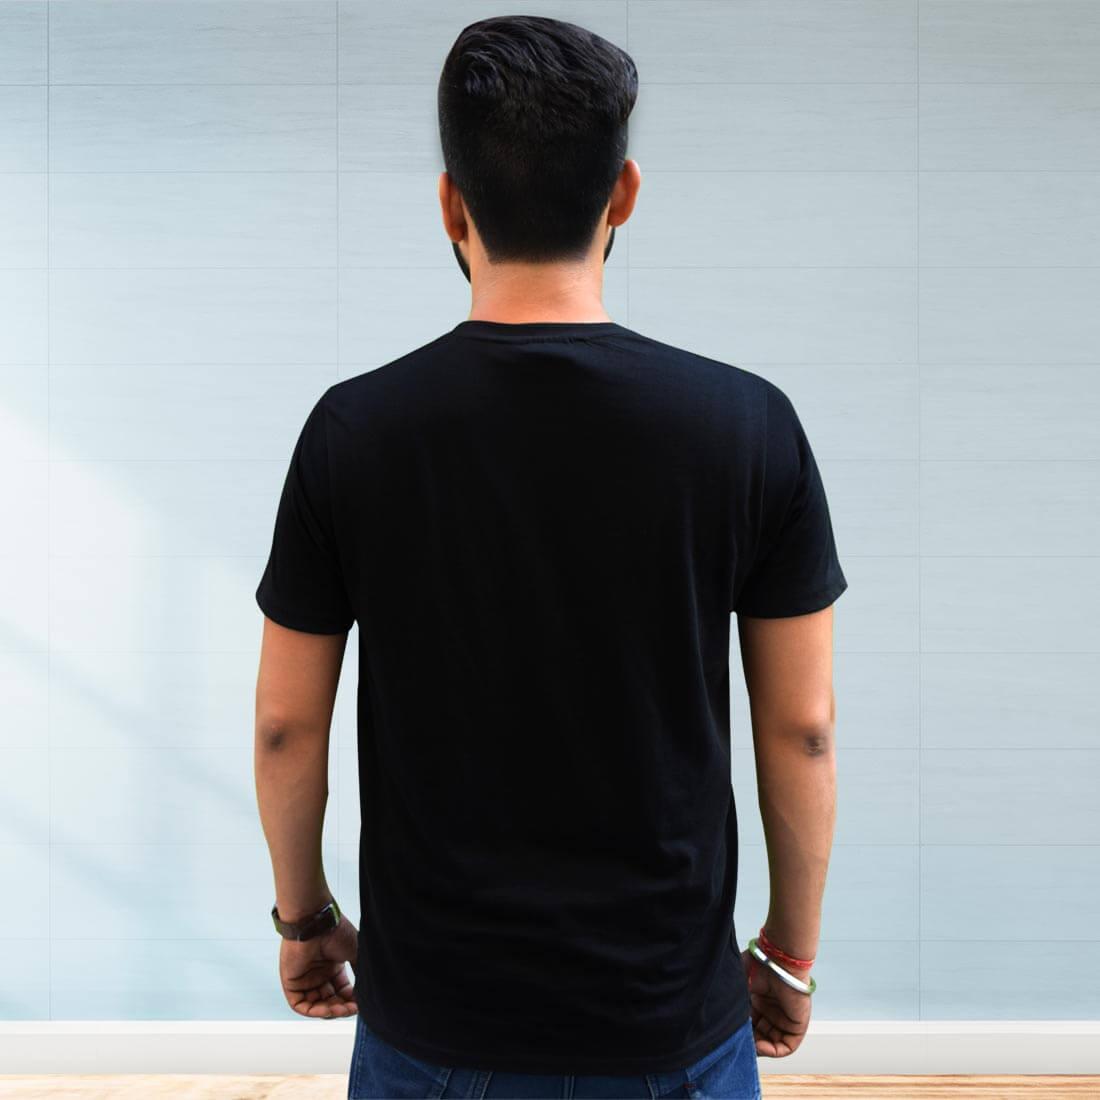 Jai Shri Ram Best Printed Black T Shirt Front and Back